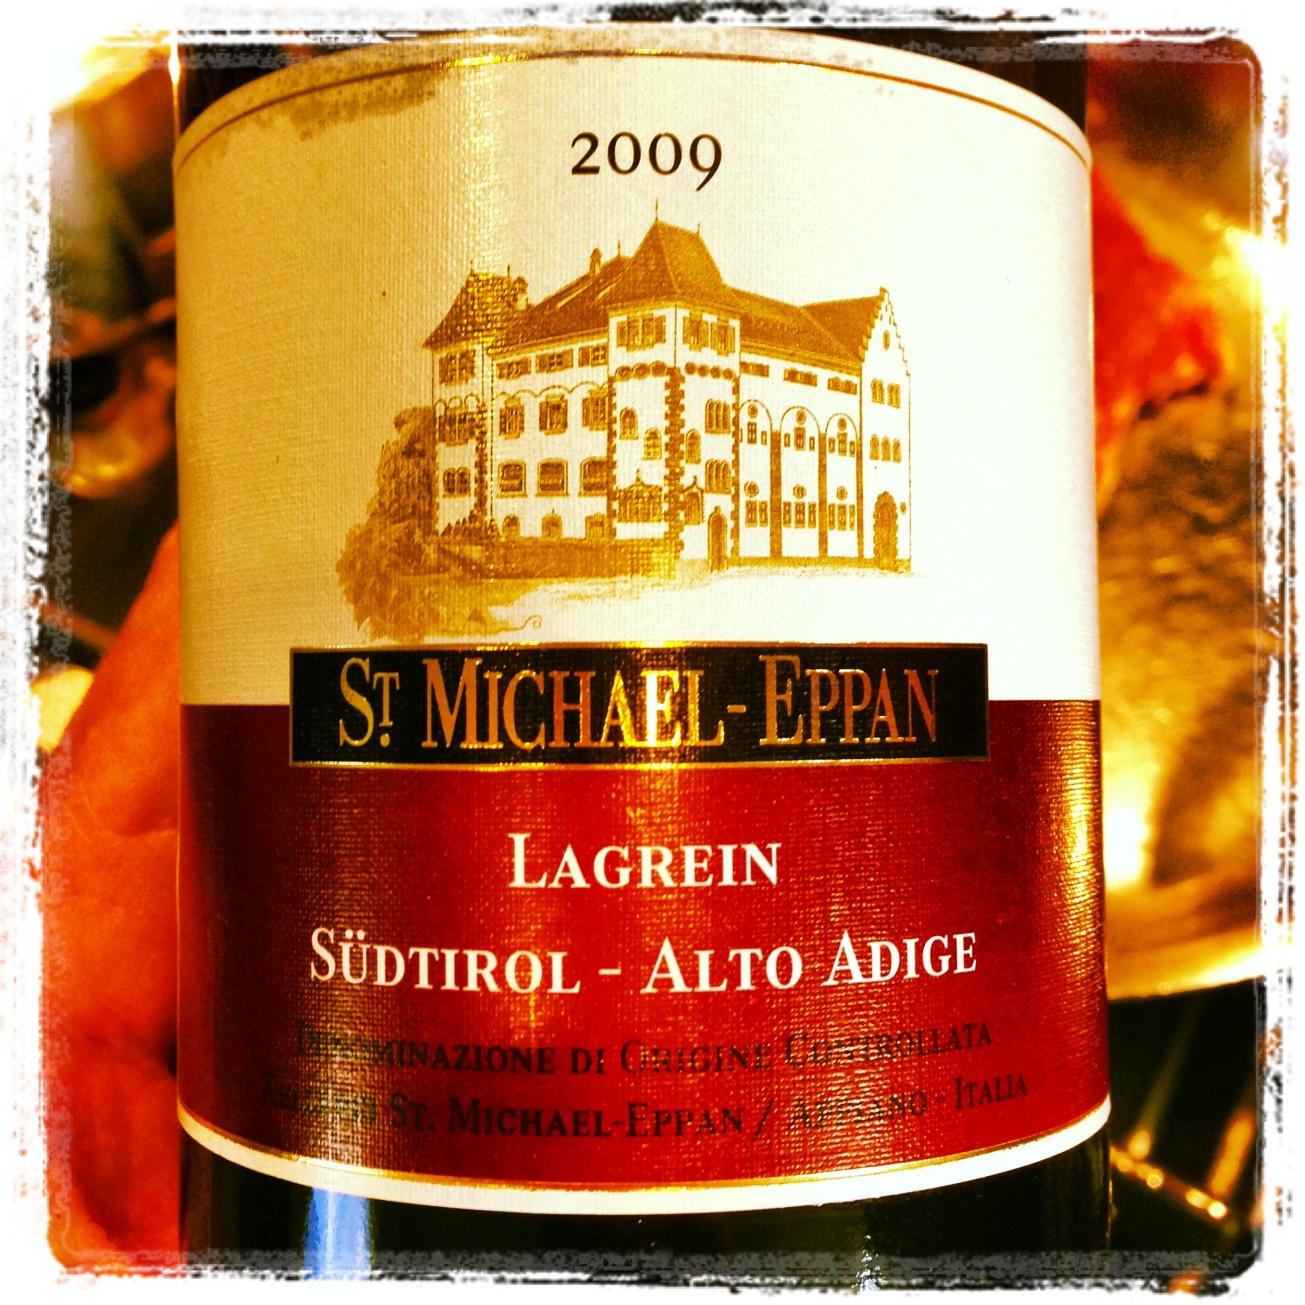 2009 San Michele Appiano (St. Michael-Eppan) Lagrein